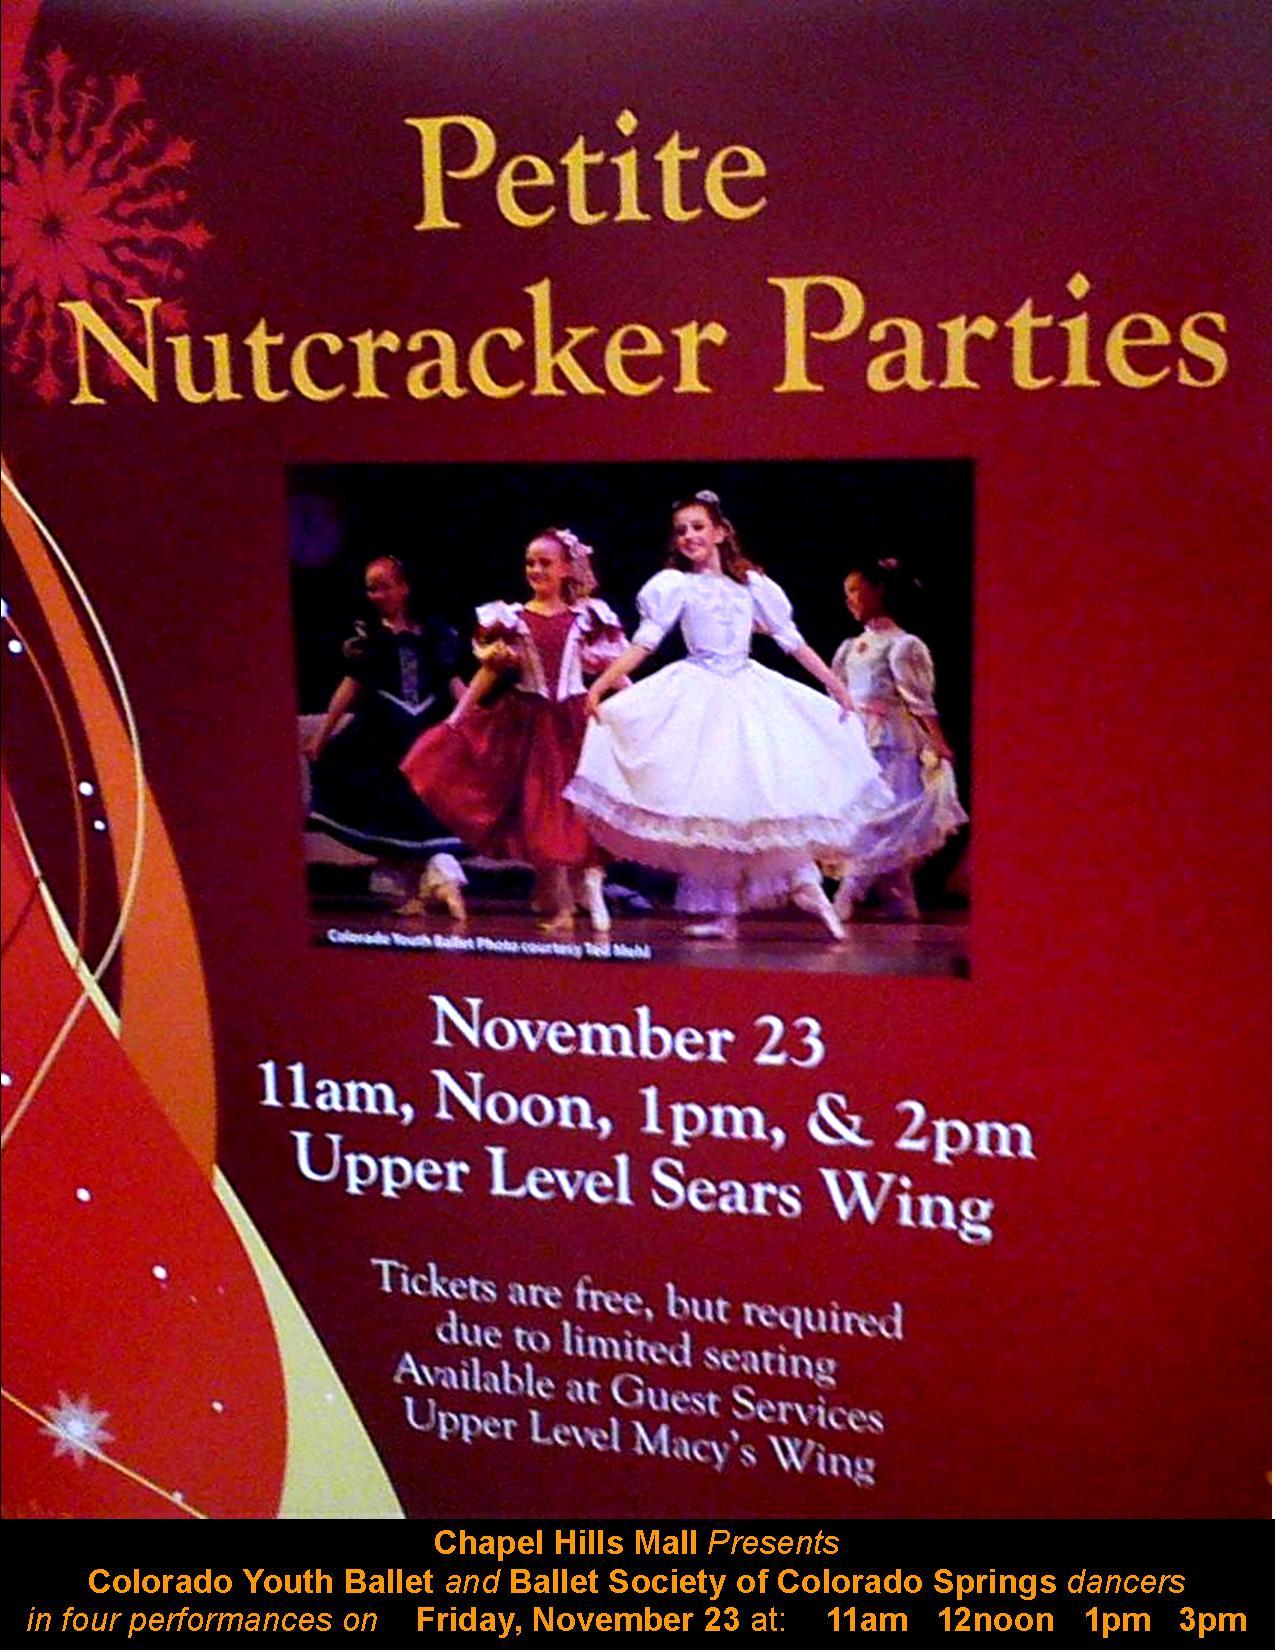 2012-11-23 Chapel Hills Mall Petite Nutcracker image